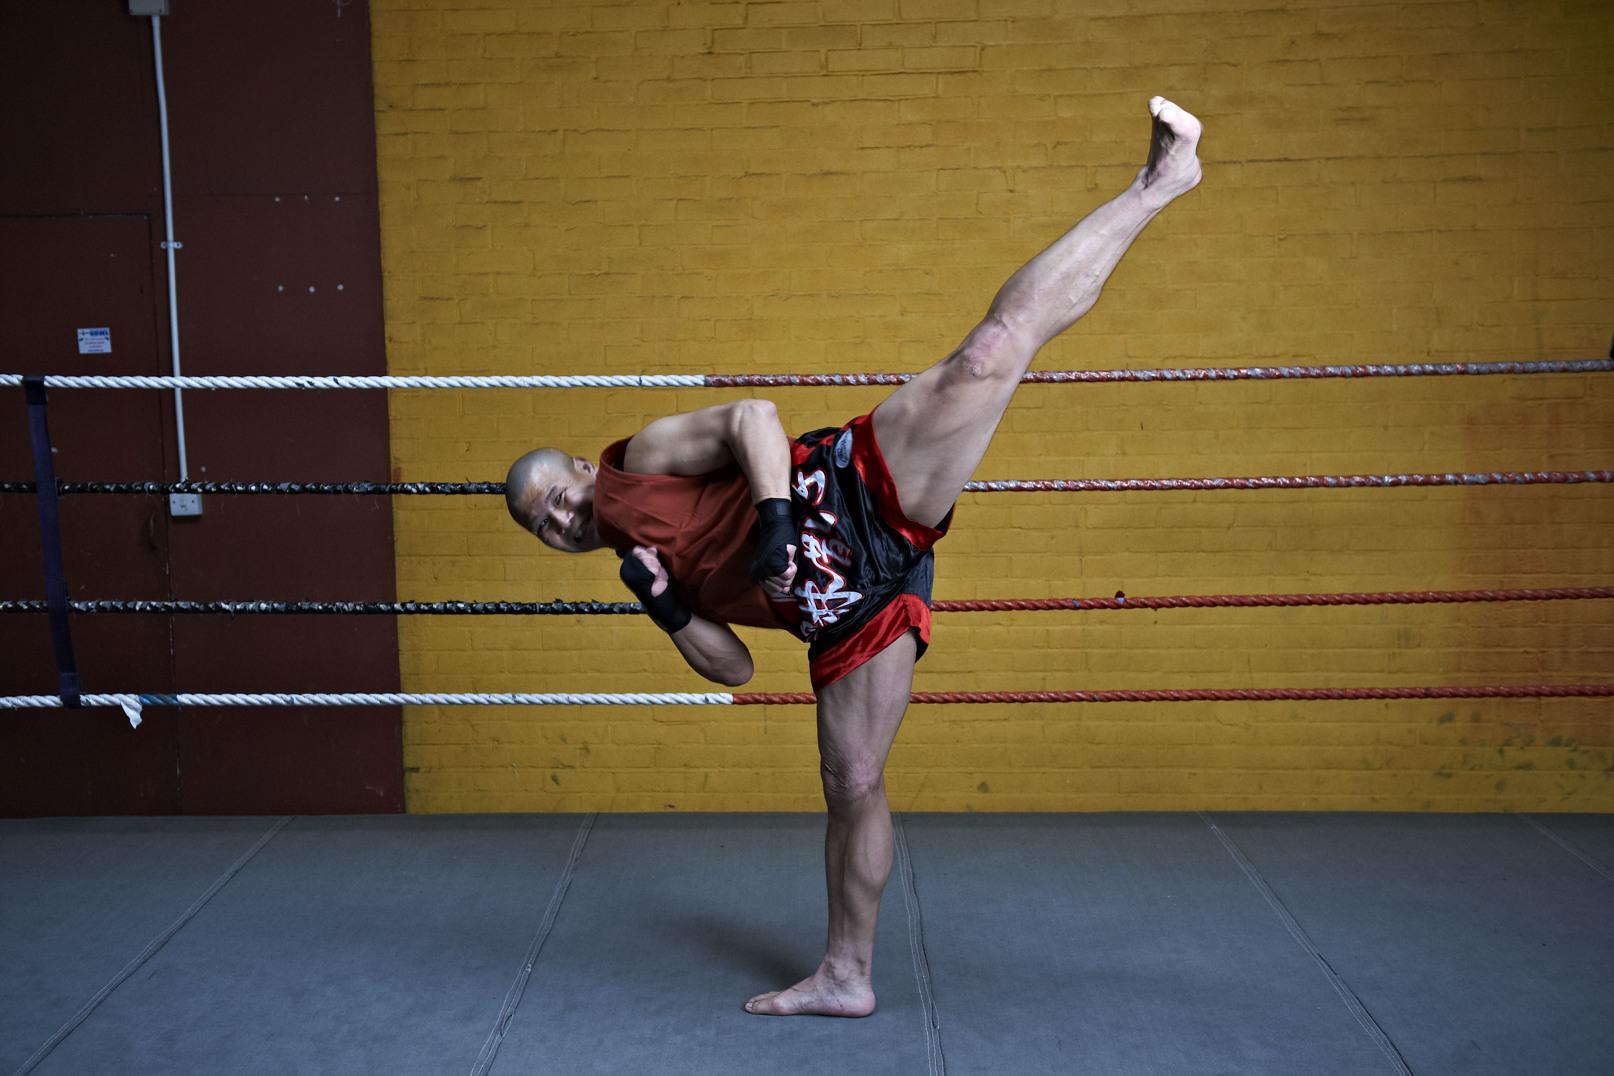 Shaolin temple uk shifu yanzi kick 32.jpg